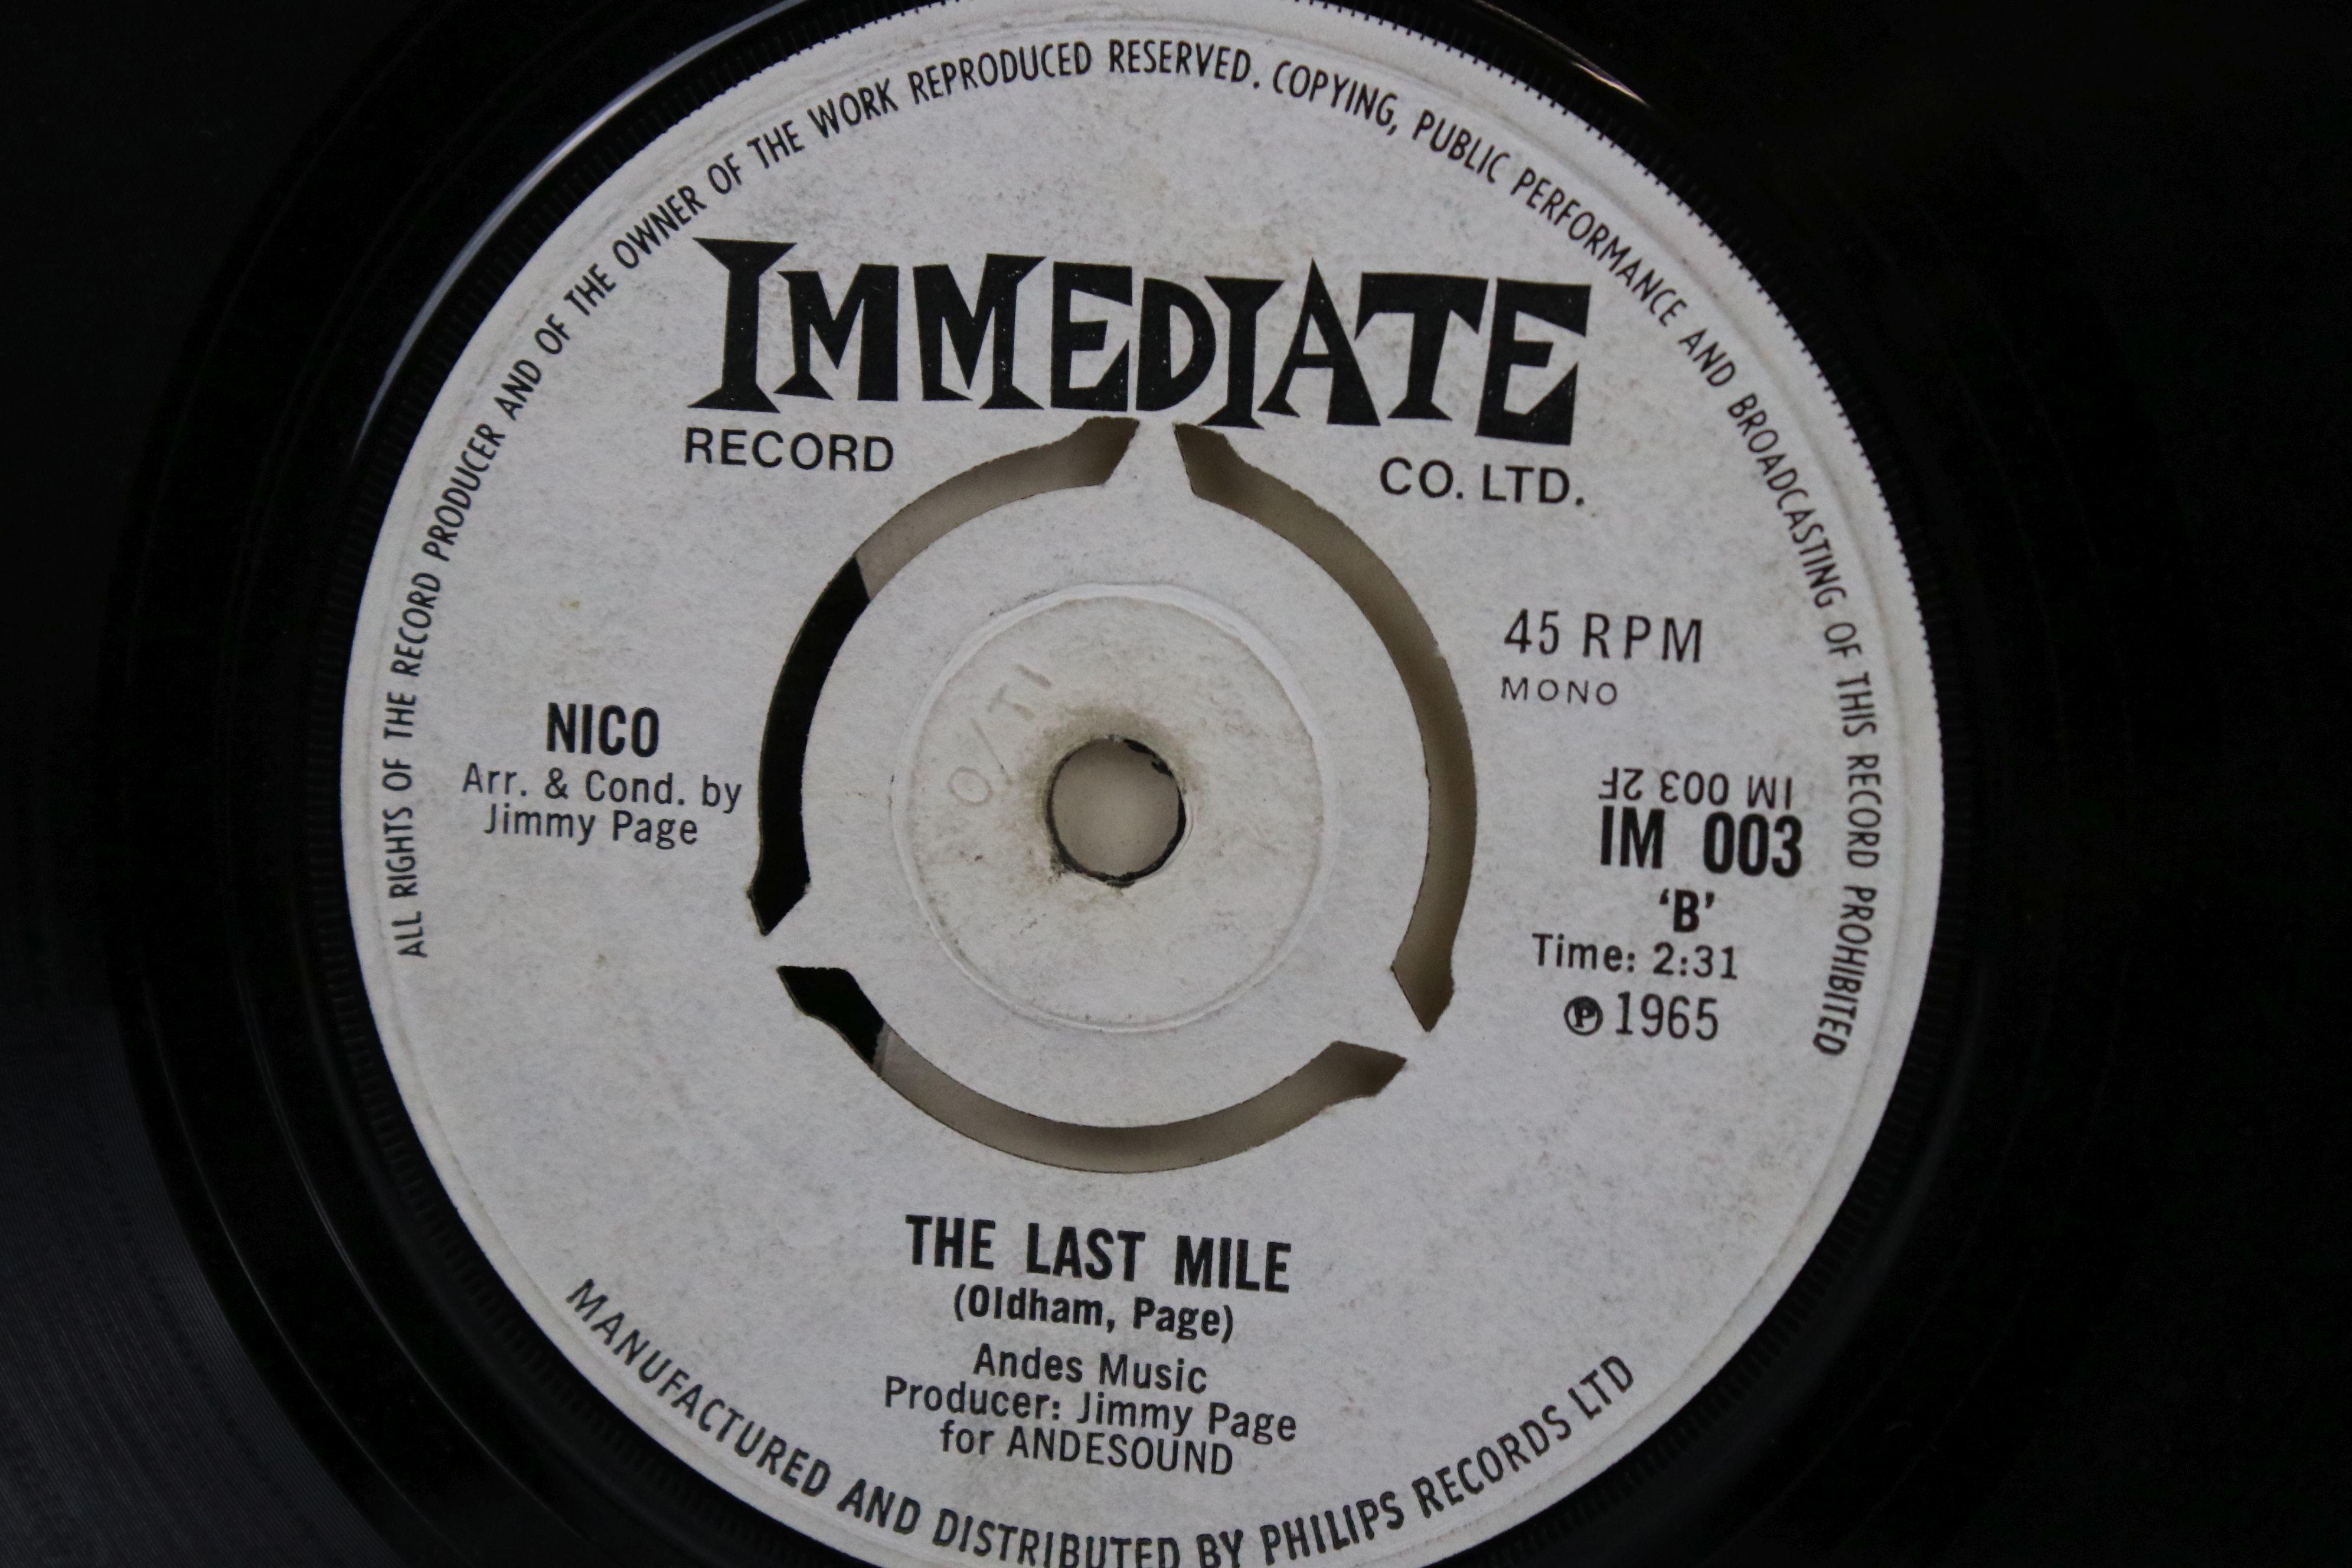 Vinyl - Nico I'm Not Sayin / The Last Mile 45 on Immediate IM003 in company sleeve, vg - Image 4 of 5